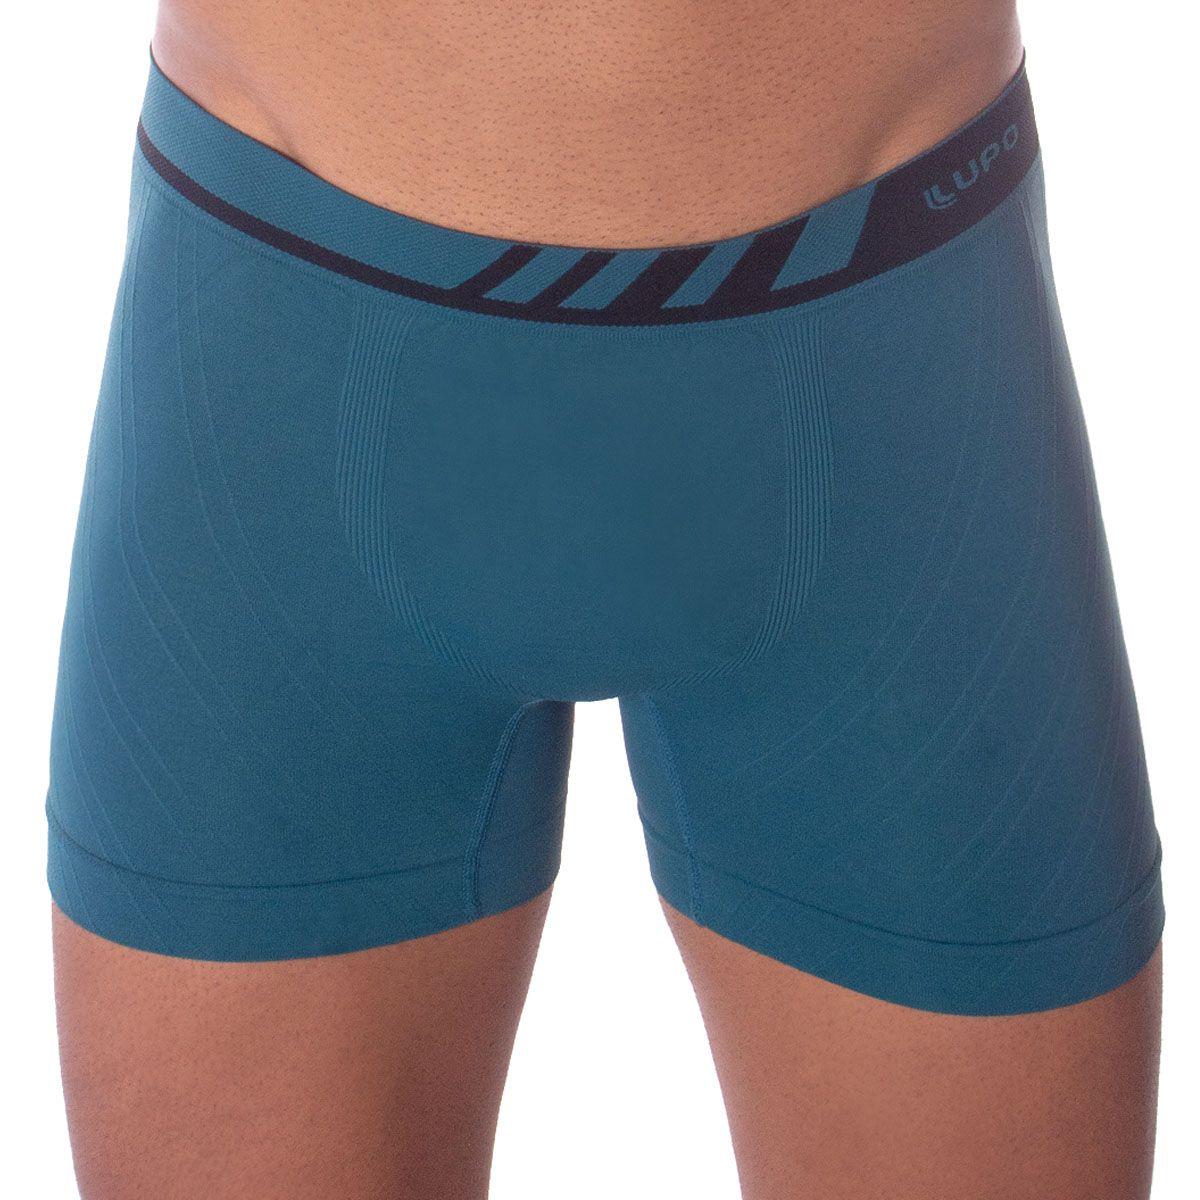 Cueca masculina para adulto modelo boxer sem costura em microfibra Lupo